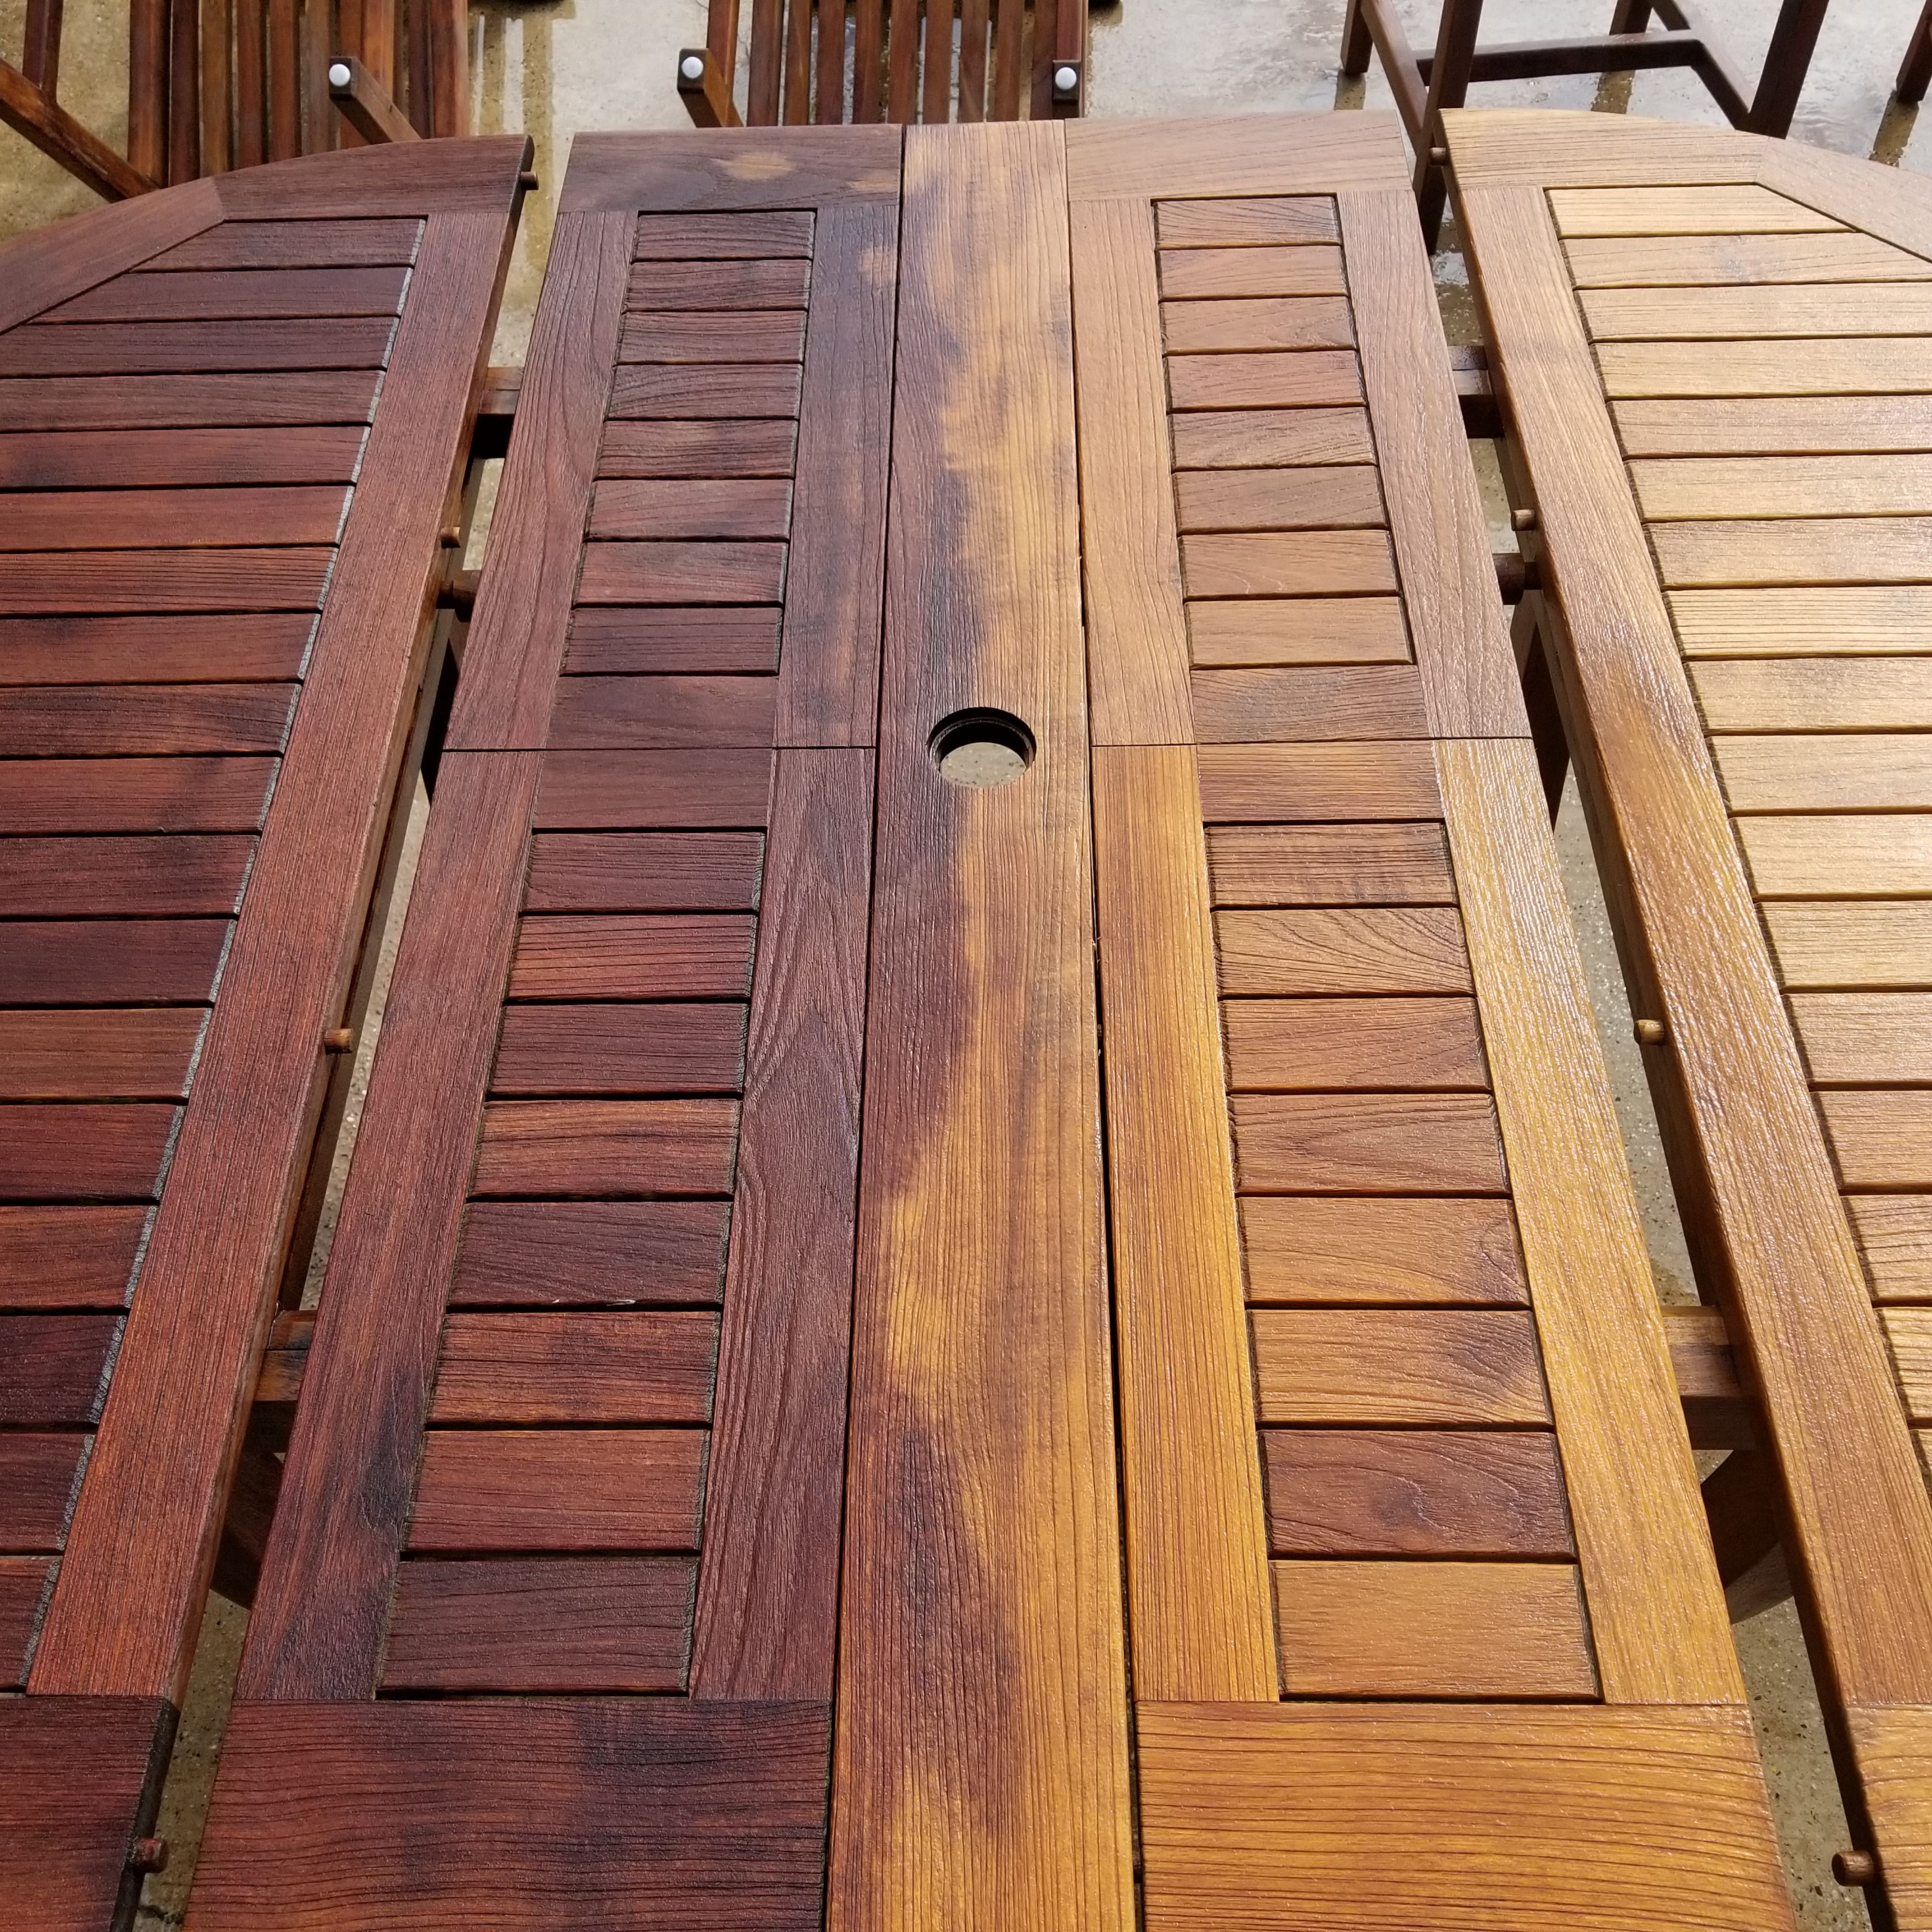 Have You Been Hesitating To Get All Your Outdoor Home Improvement Needs Met Here At Deck Restoration Pl Cedar Siding Deck Restoration Installing Cedar Siding